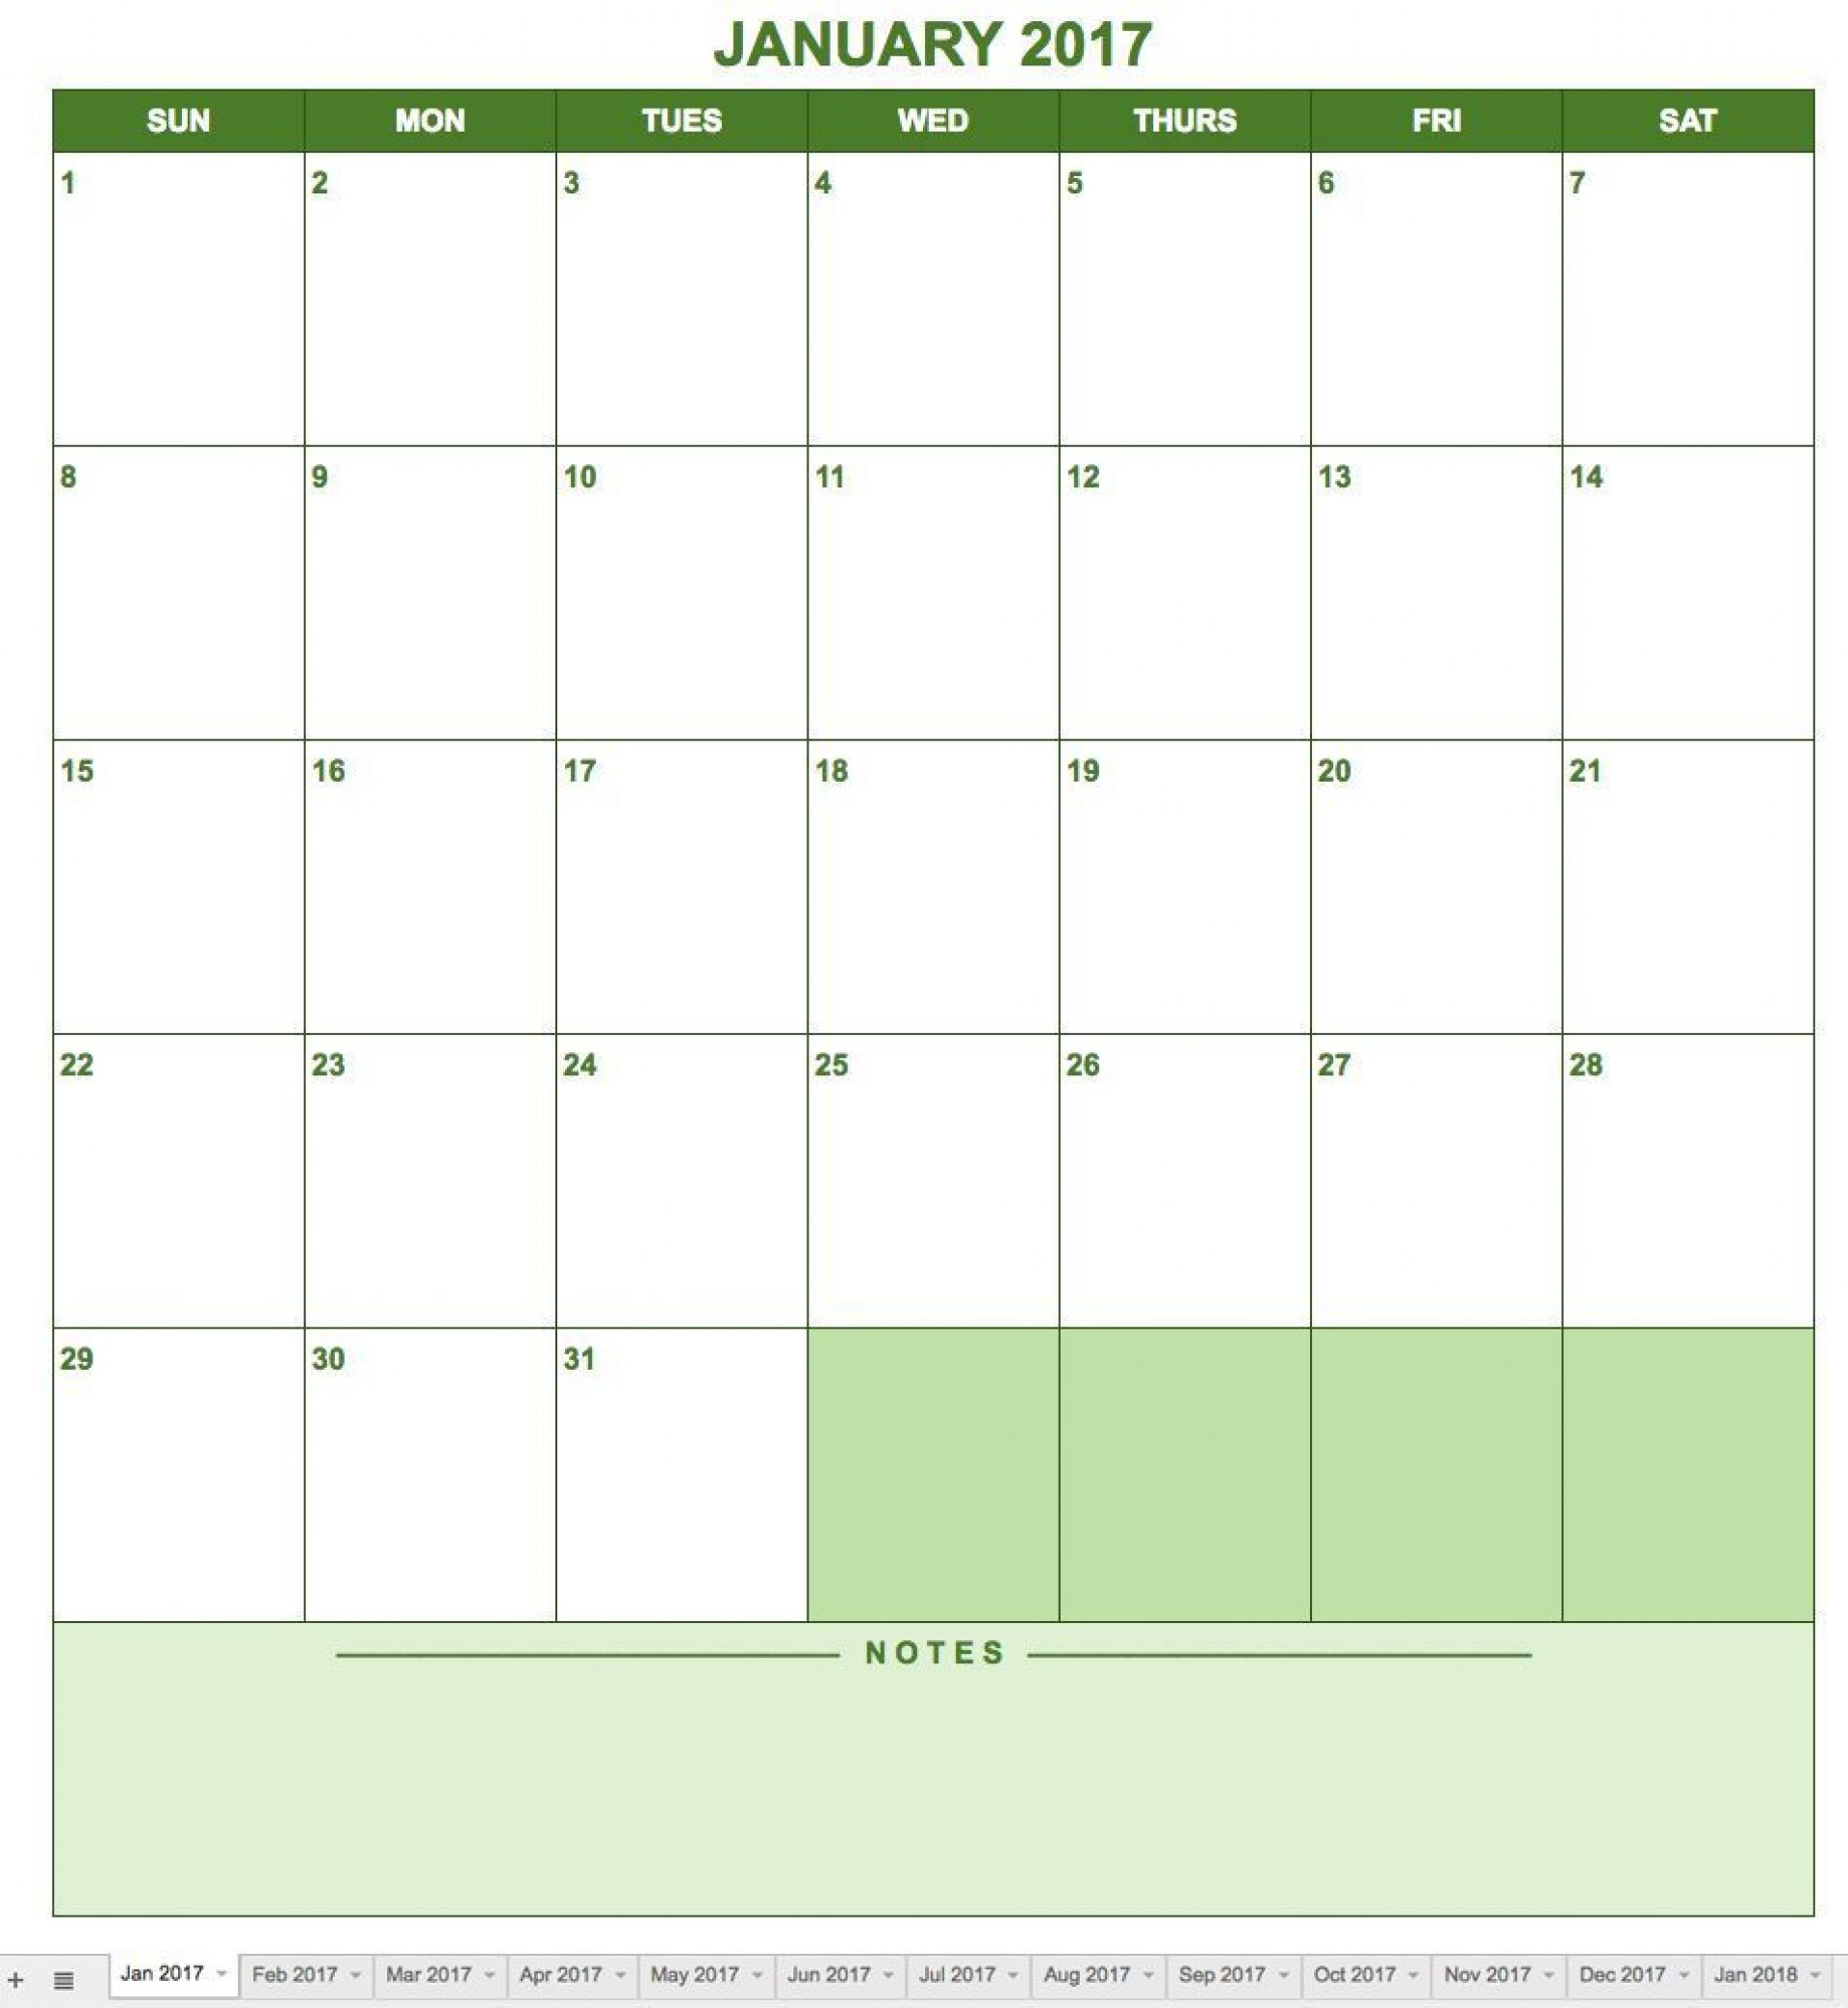 003 Stupendou Google Calendar Template 2017 High Def 1920